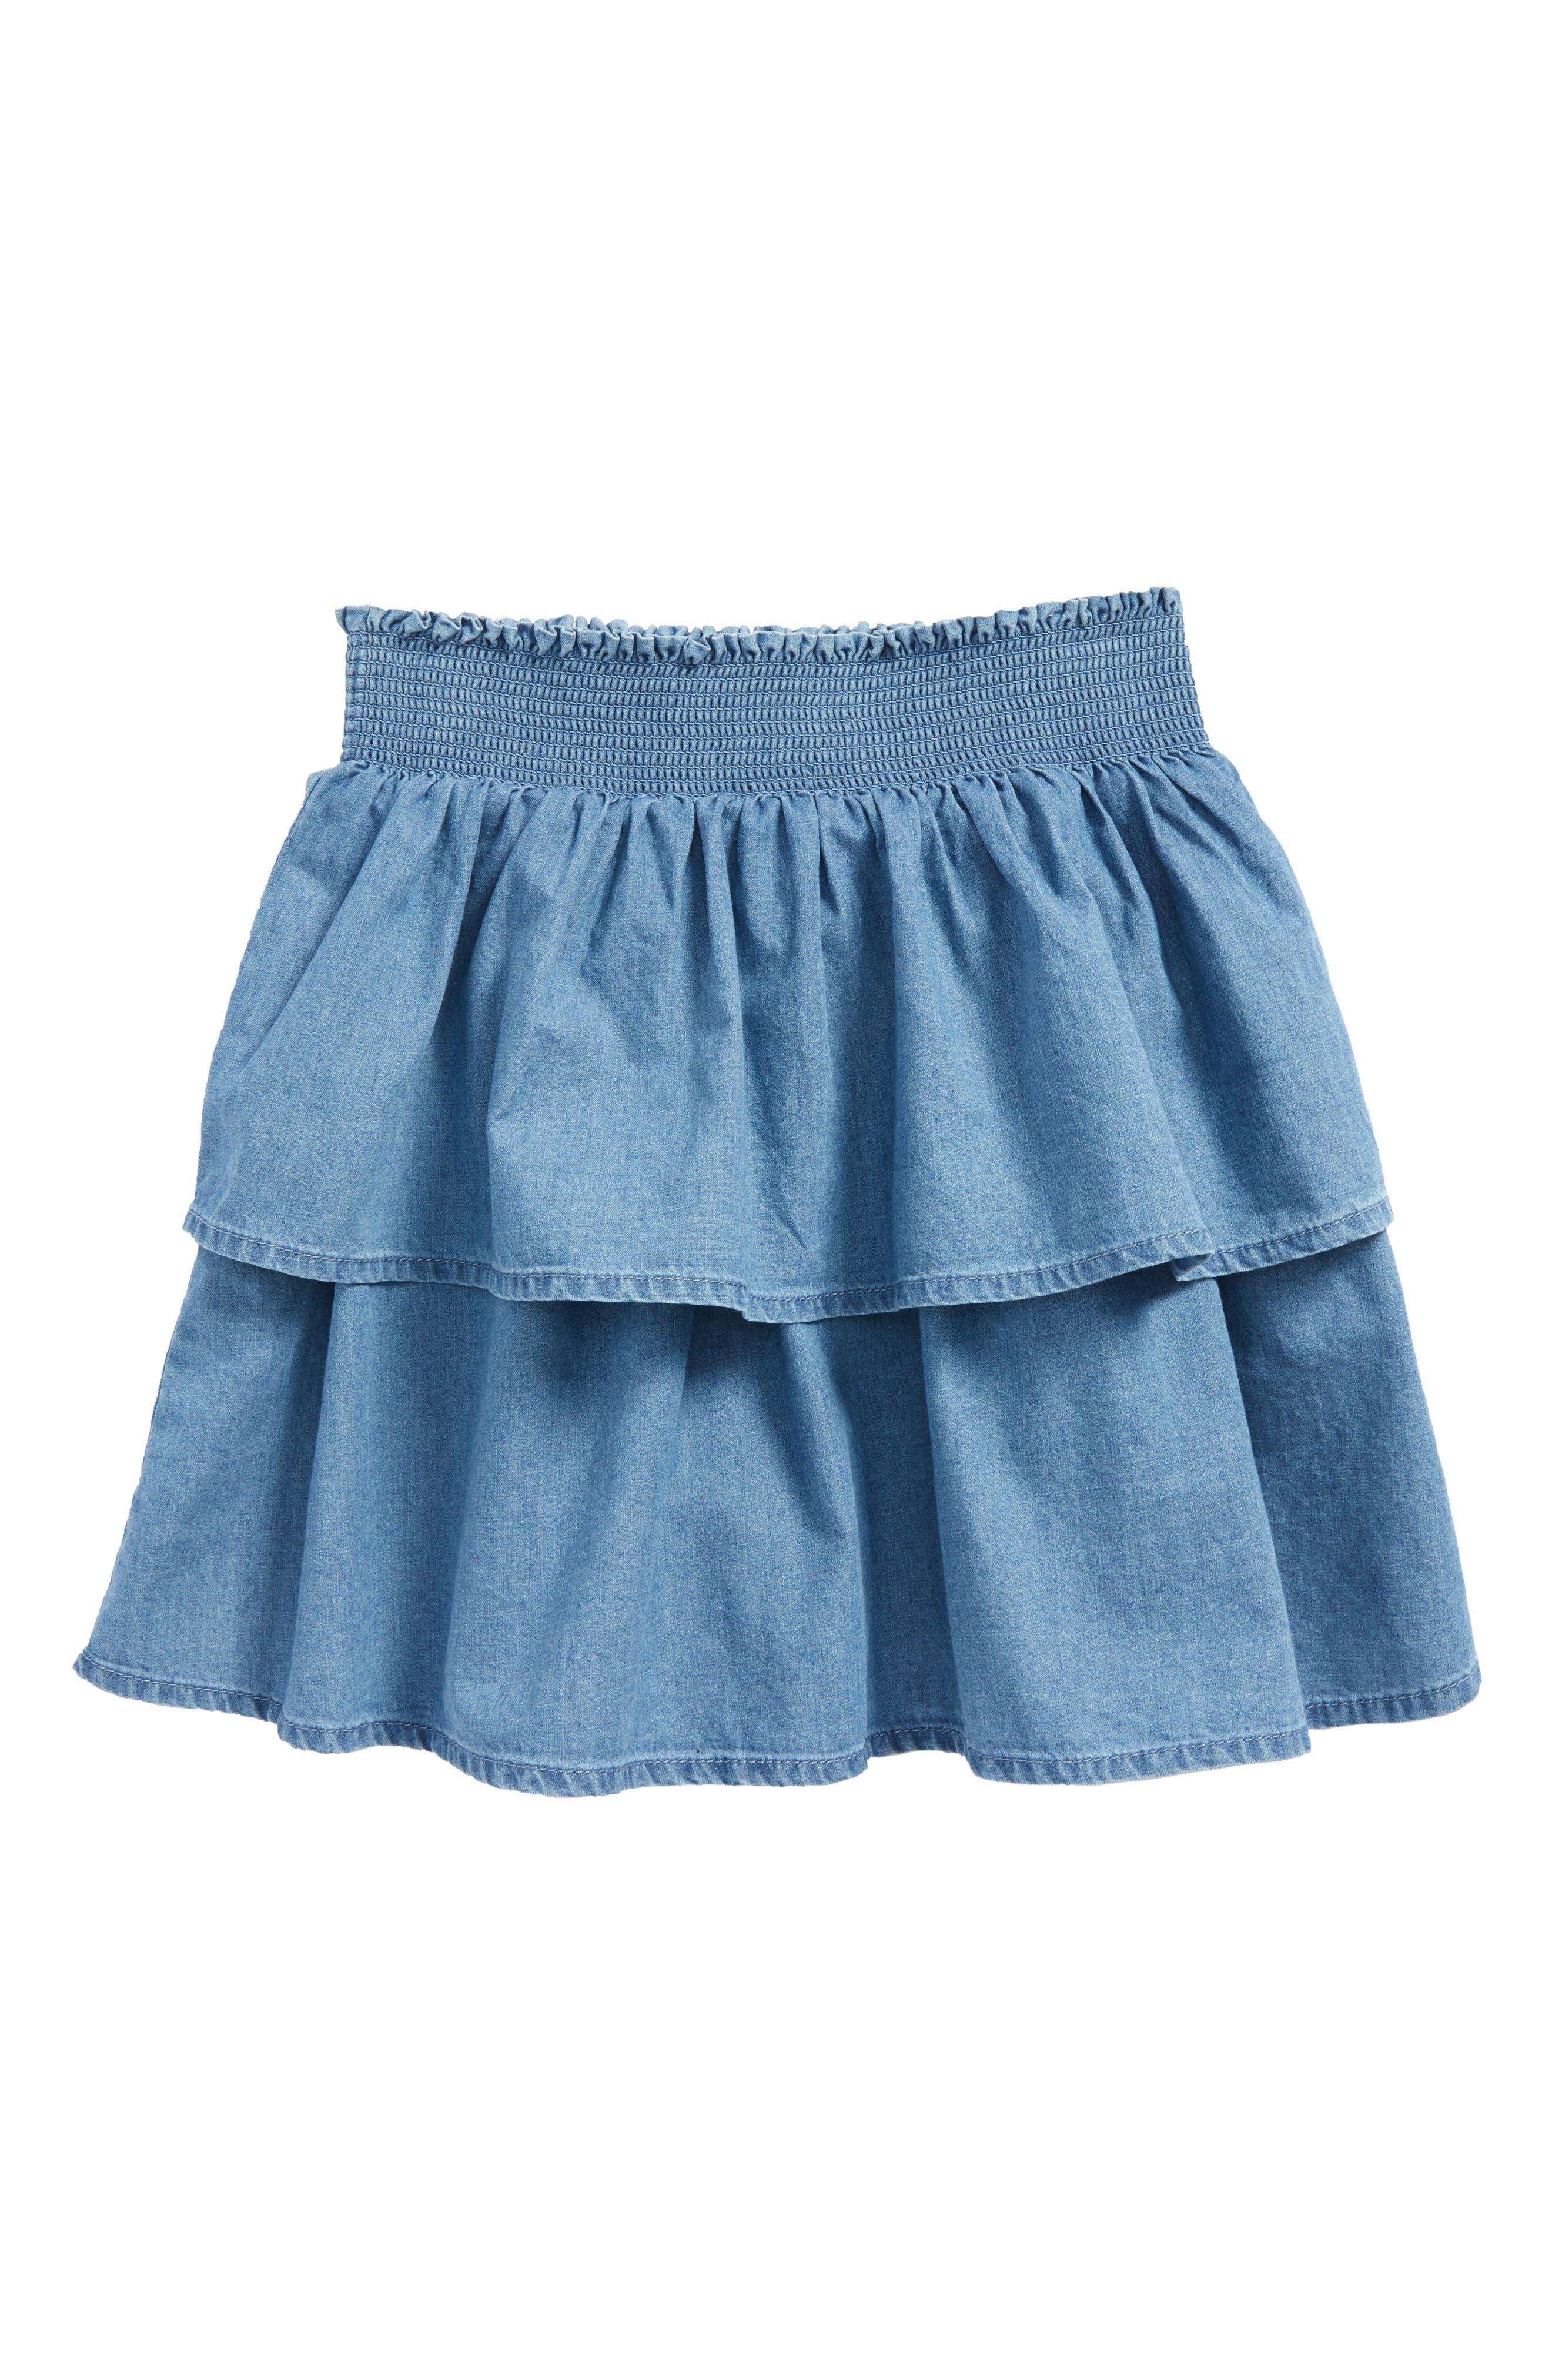 Ruffle Denim Skirt,                         Main,                         color, Chambray Mch